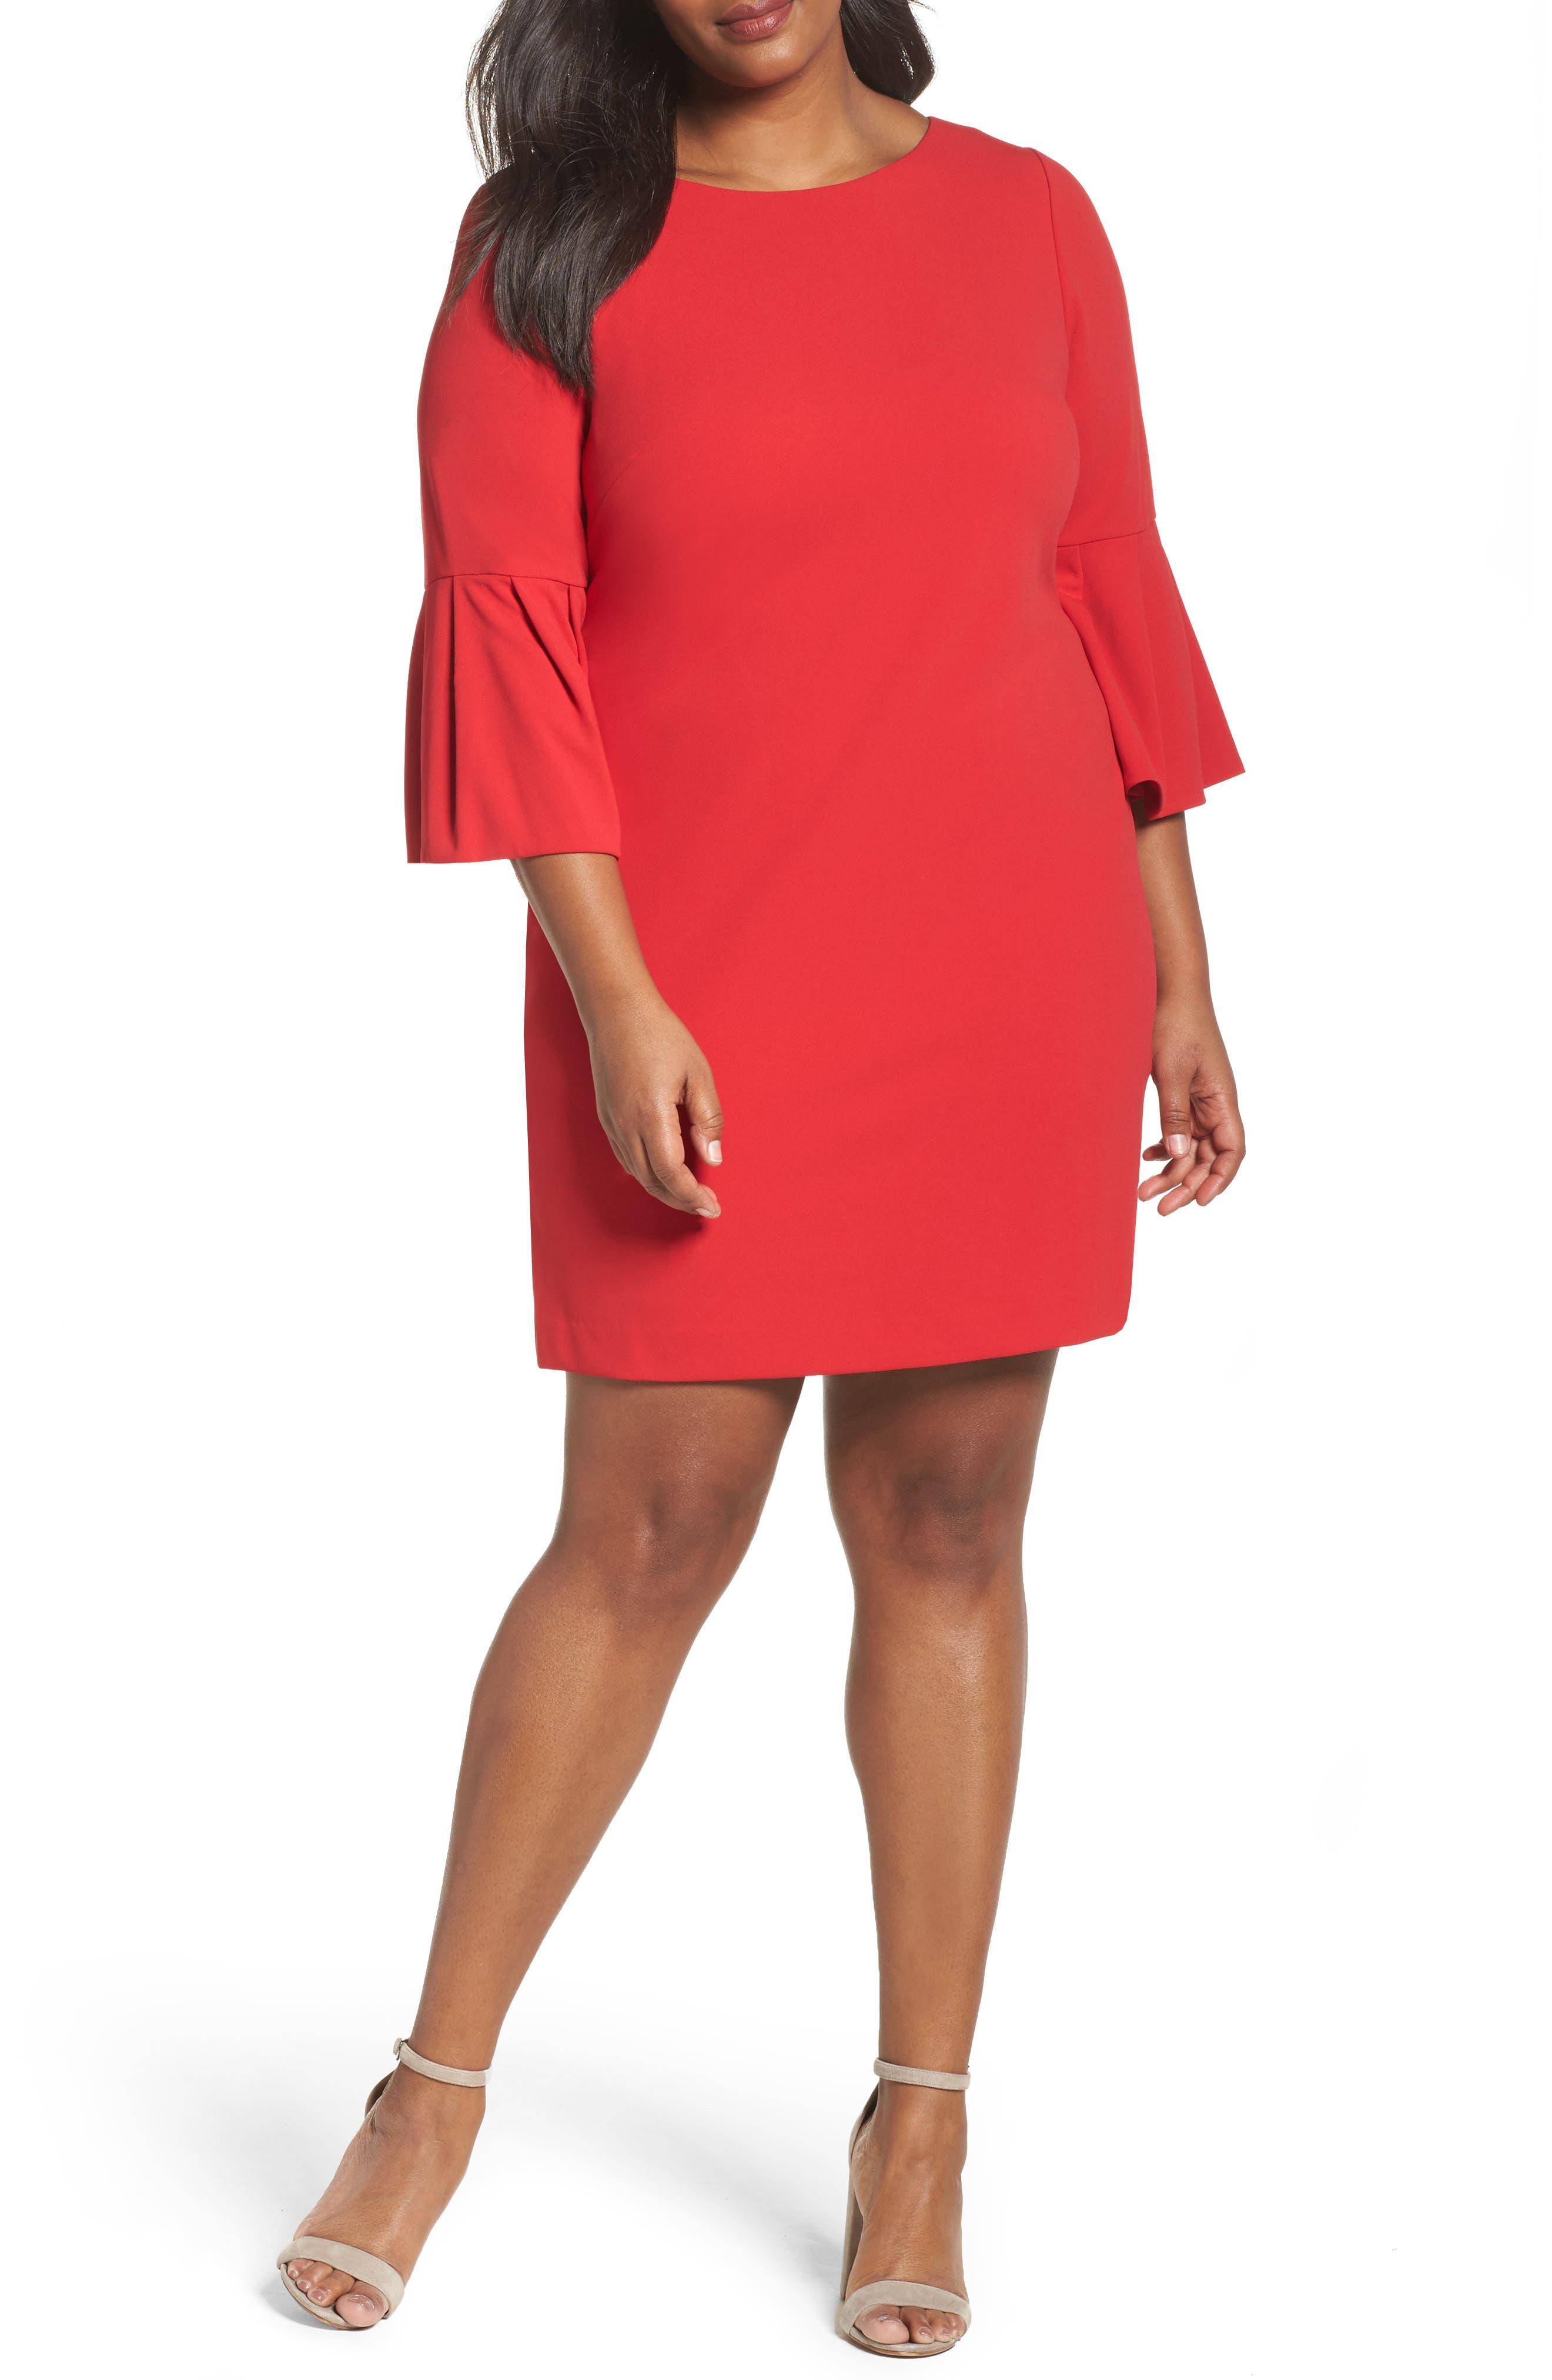 Alternate Image 1 Selected - Eliza J Bell Sleeve Shift Dress (Plus Size)